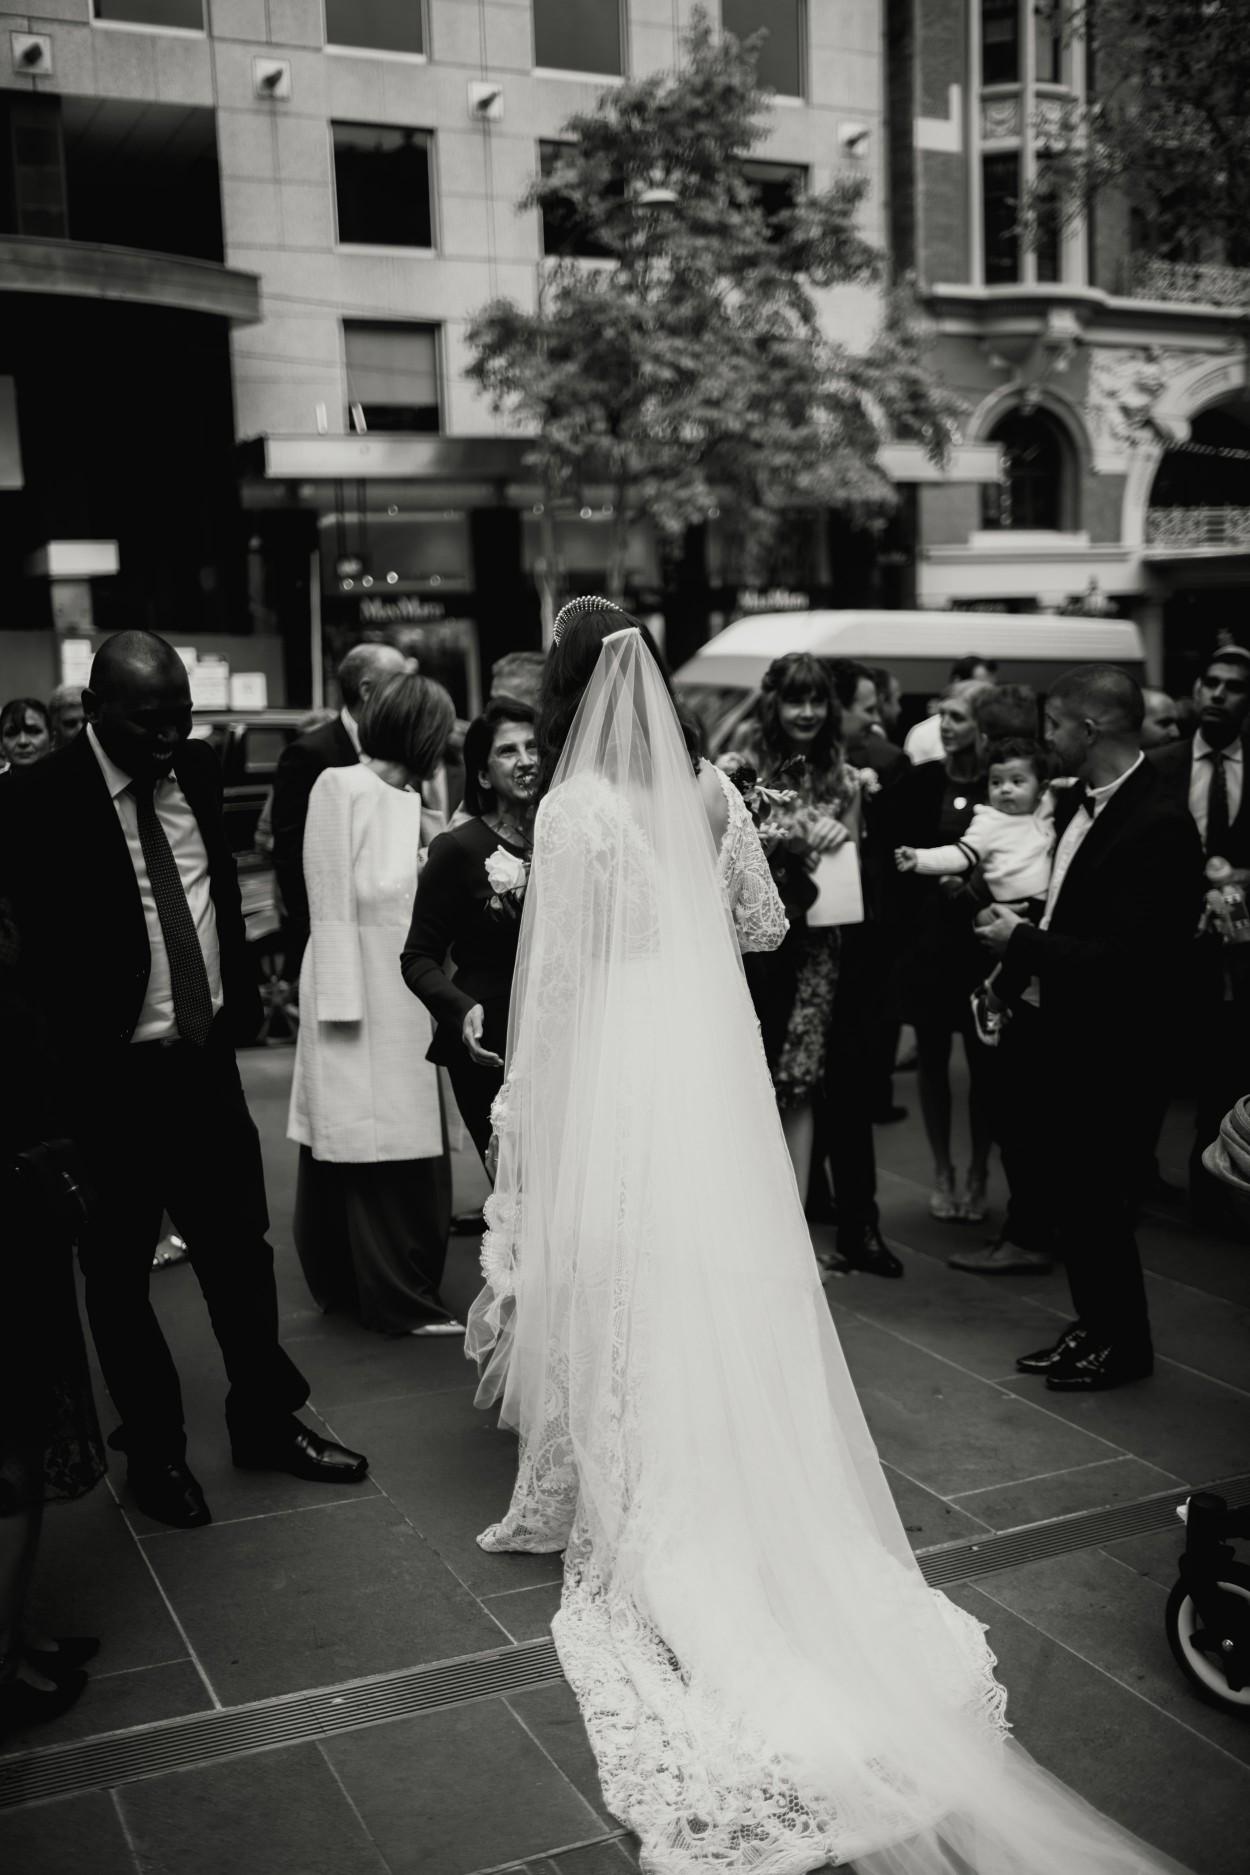 I-Got-You-Babe-Weddings-The-042George-Ballroom-St-Kilda-Wedding-Amy-Abhi.jpg